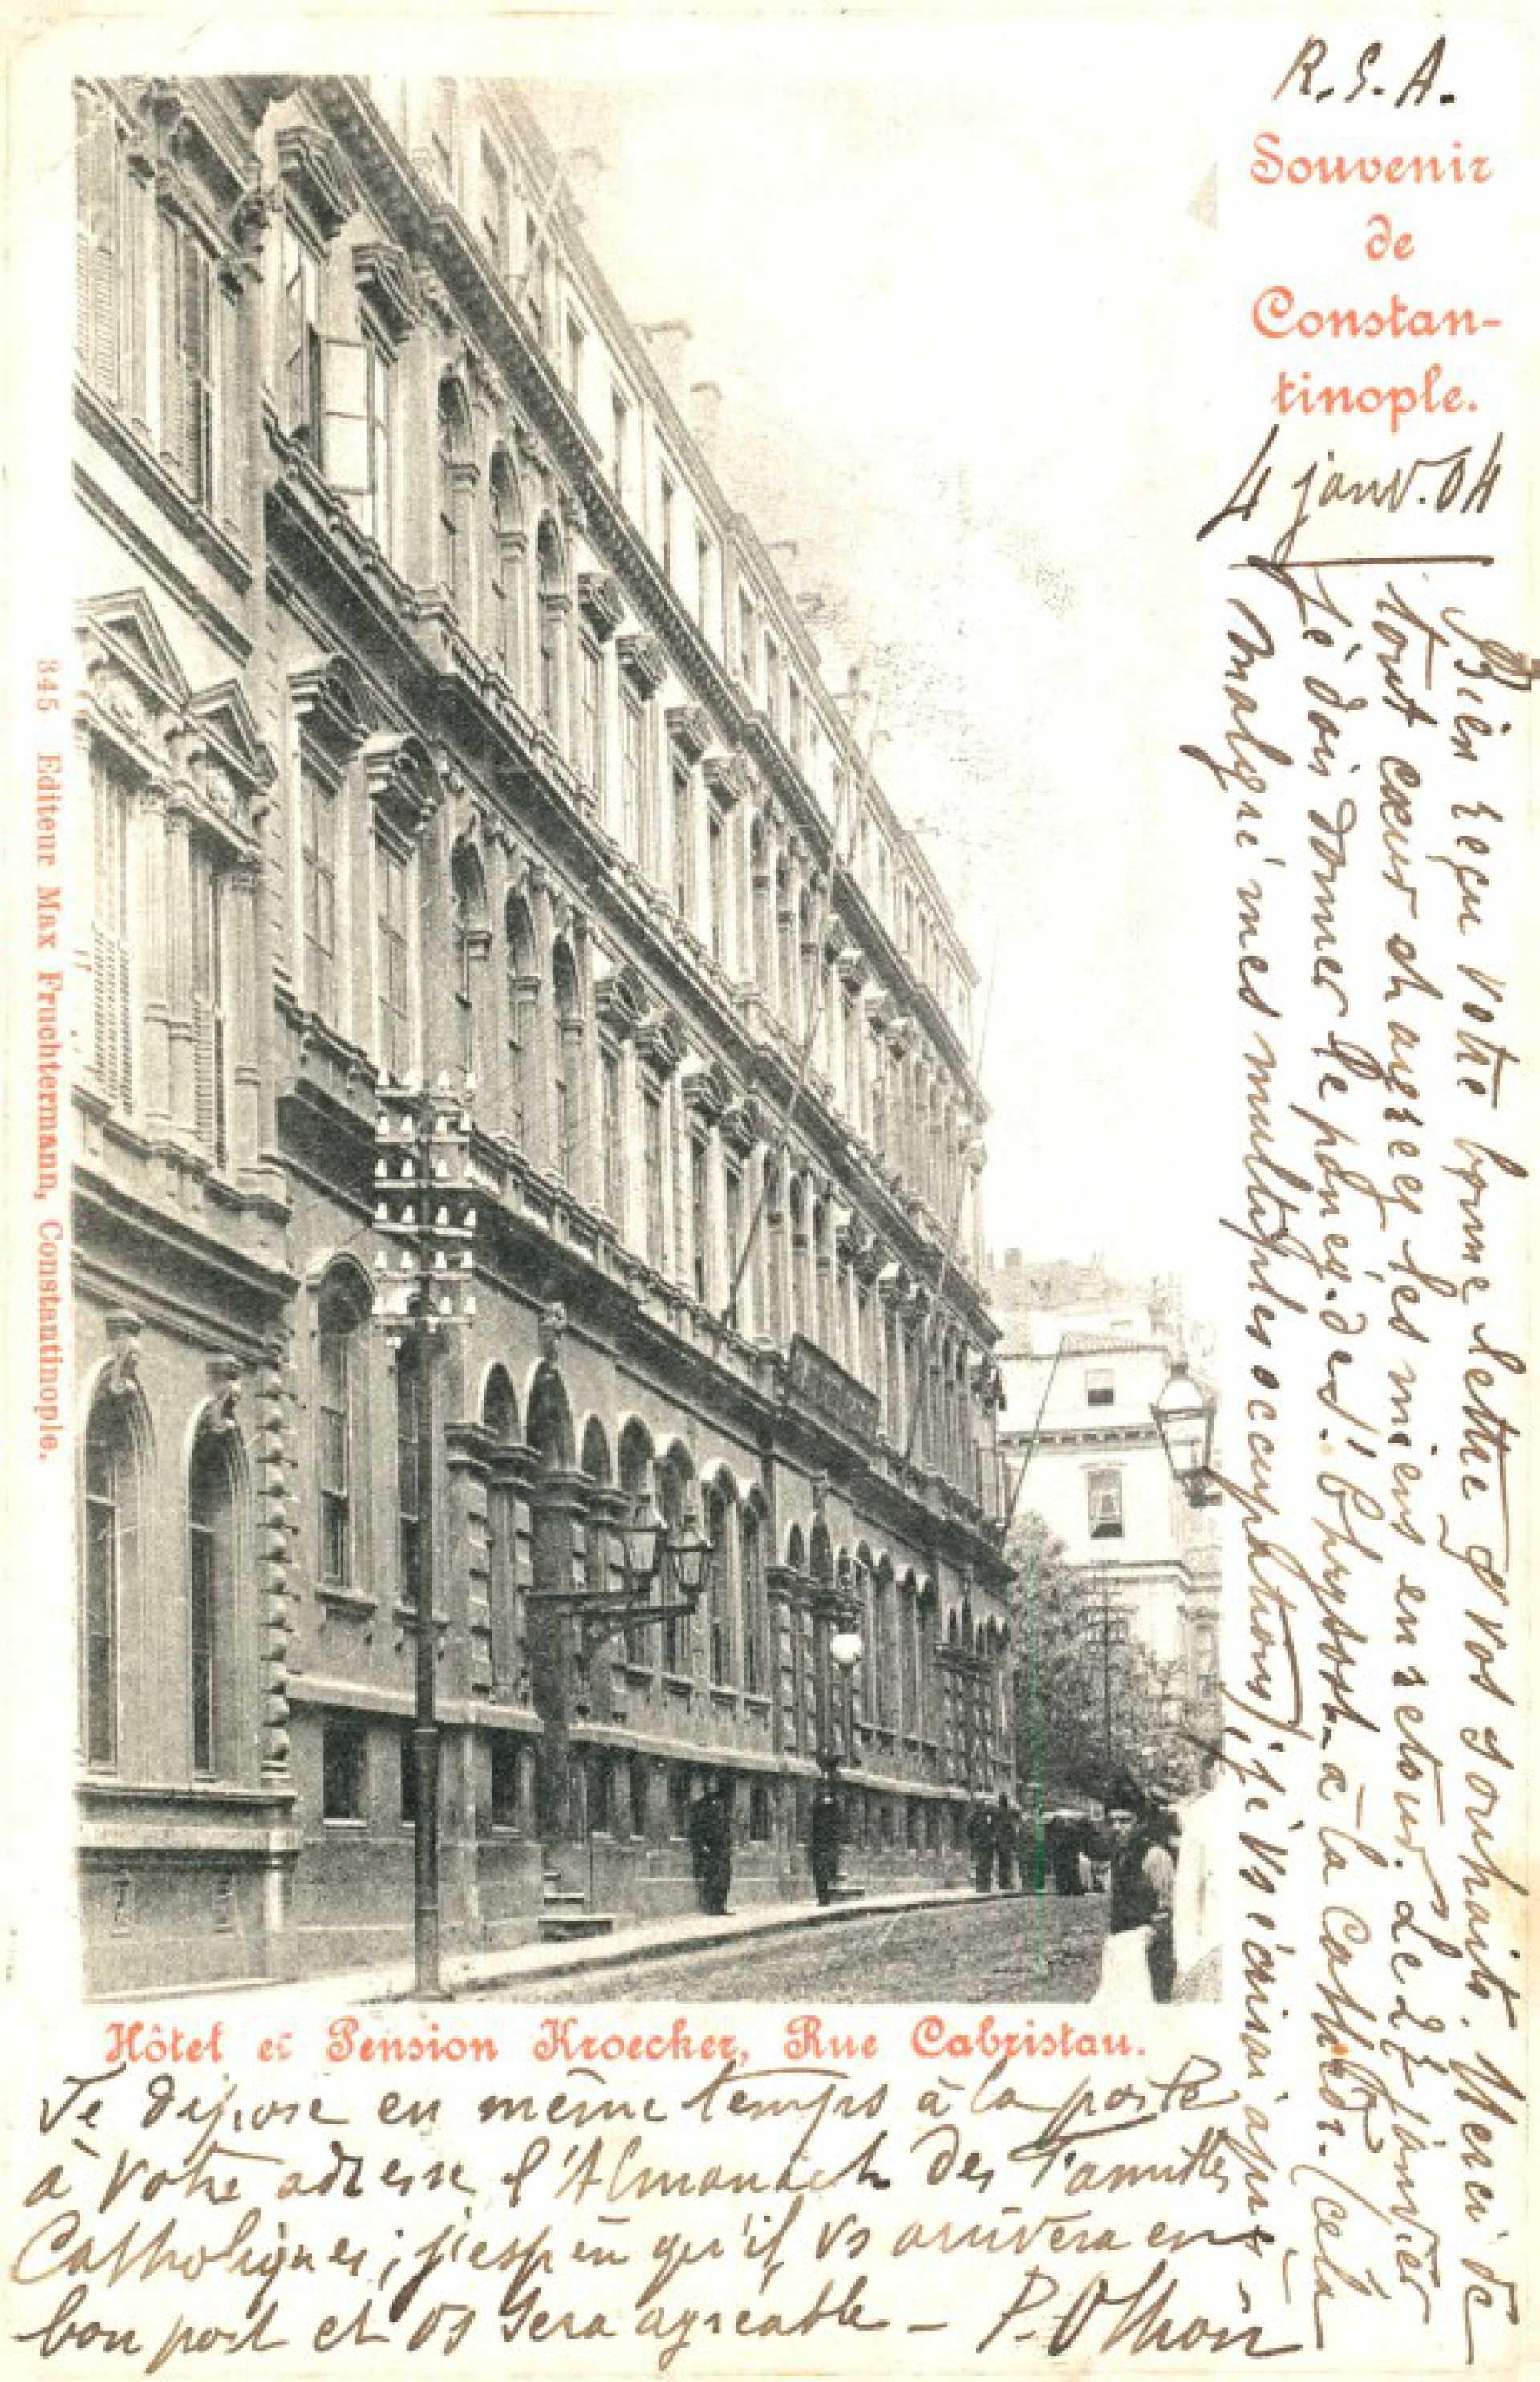 Hotel et Pension Kroecher. Rue Cabristan